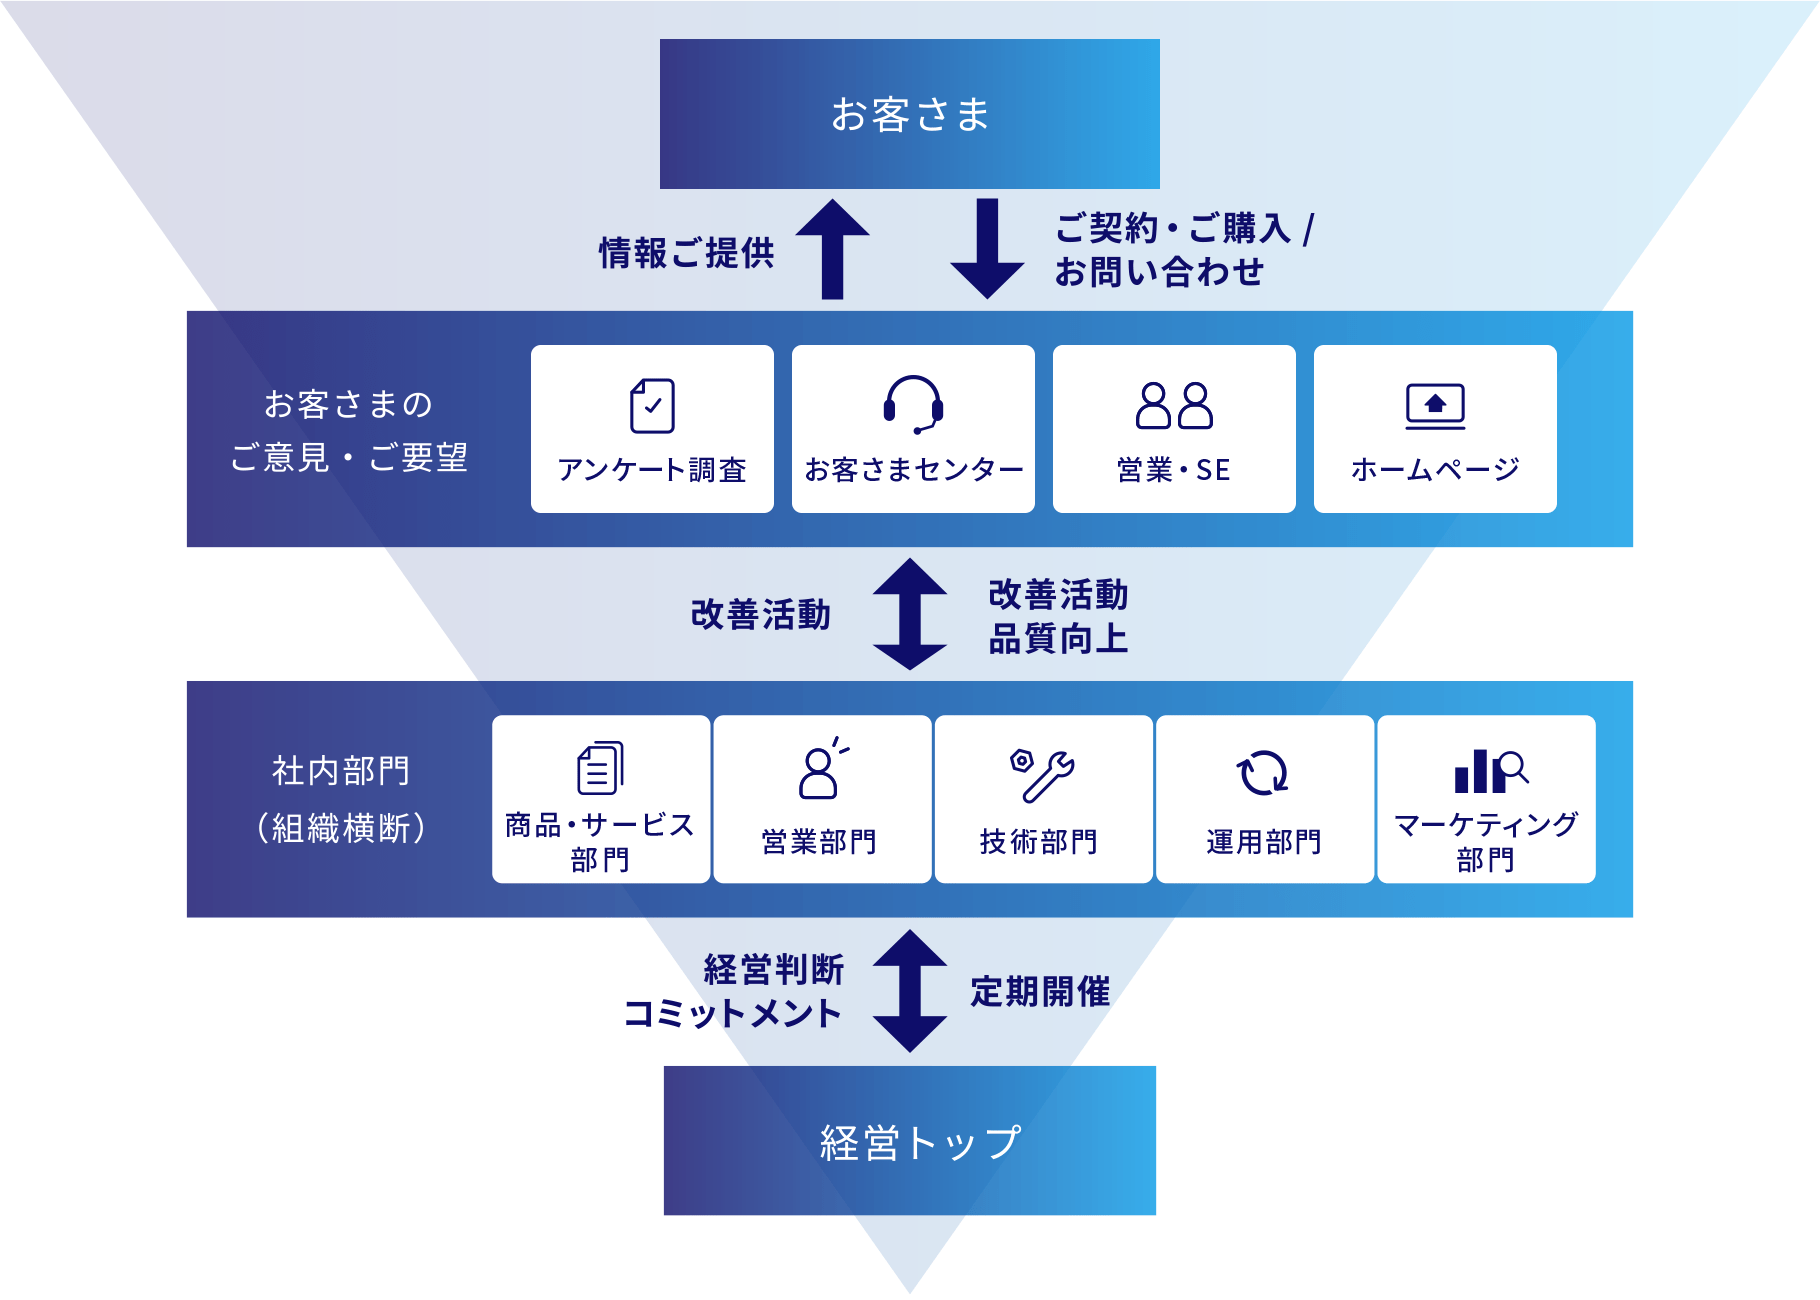 KDDI・グループ会社の体制 フロー図